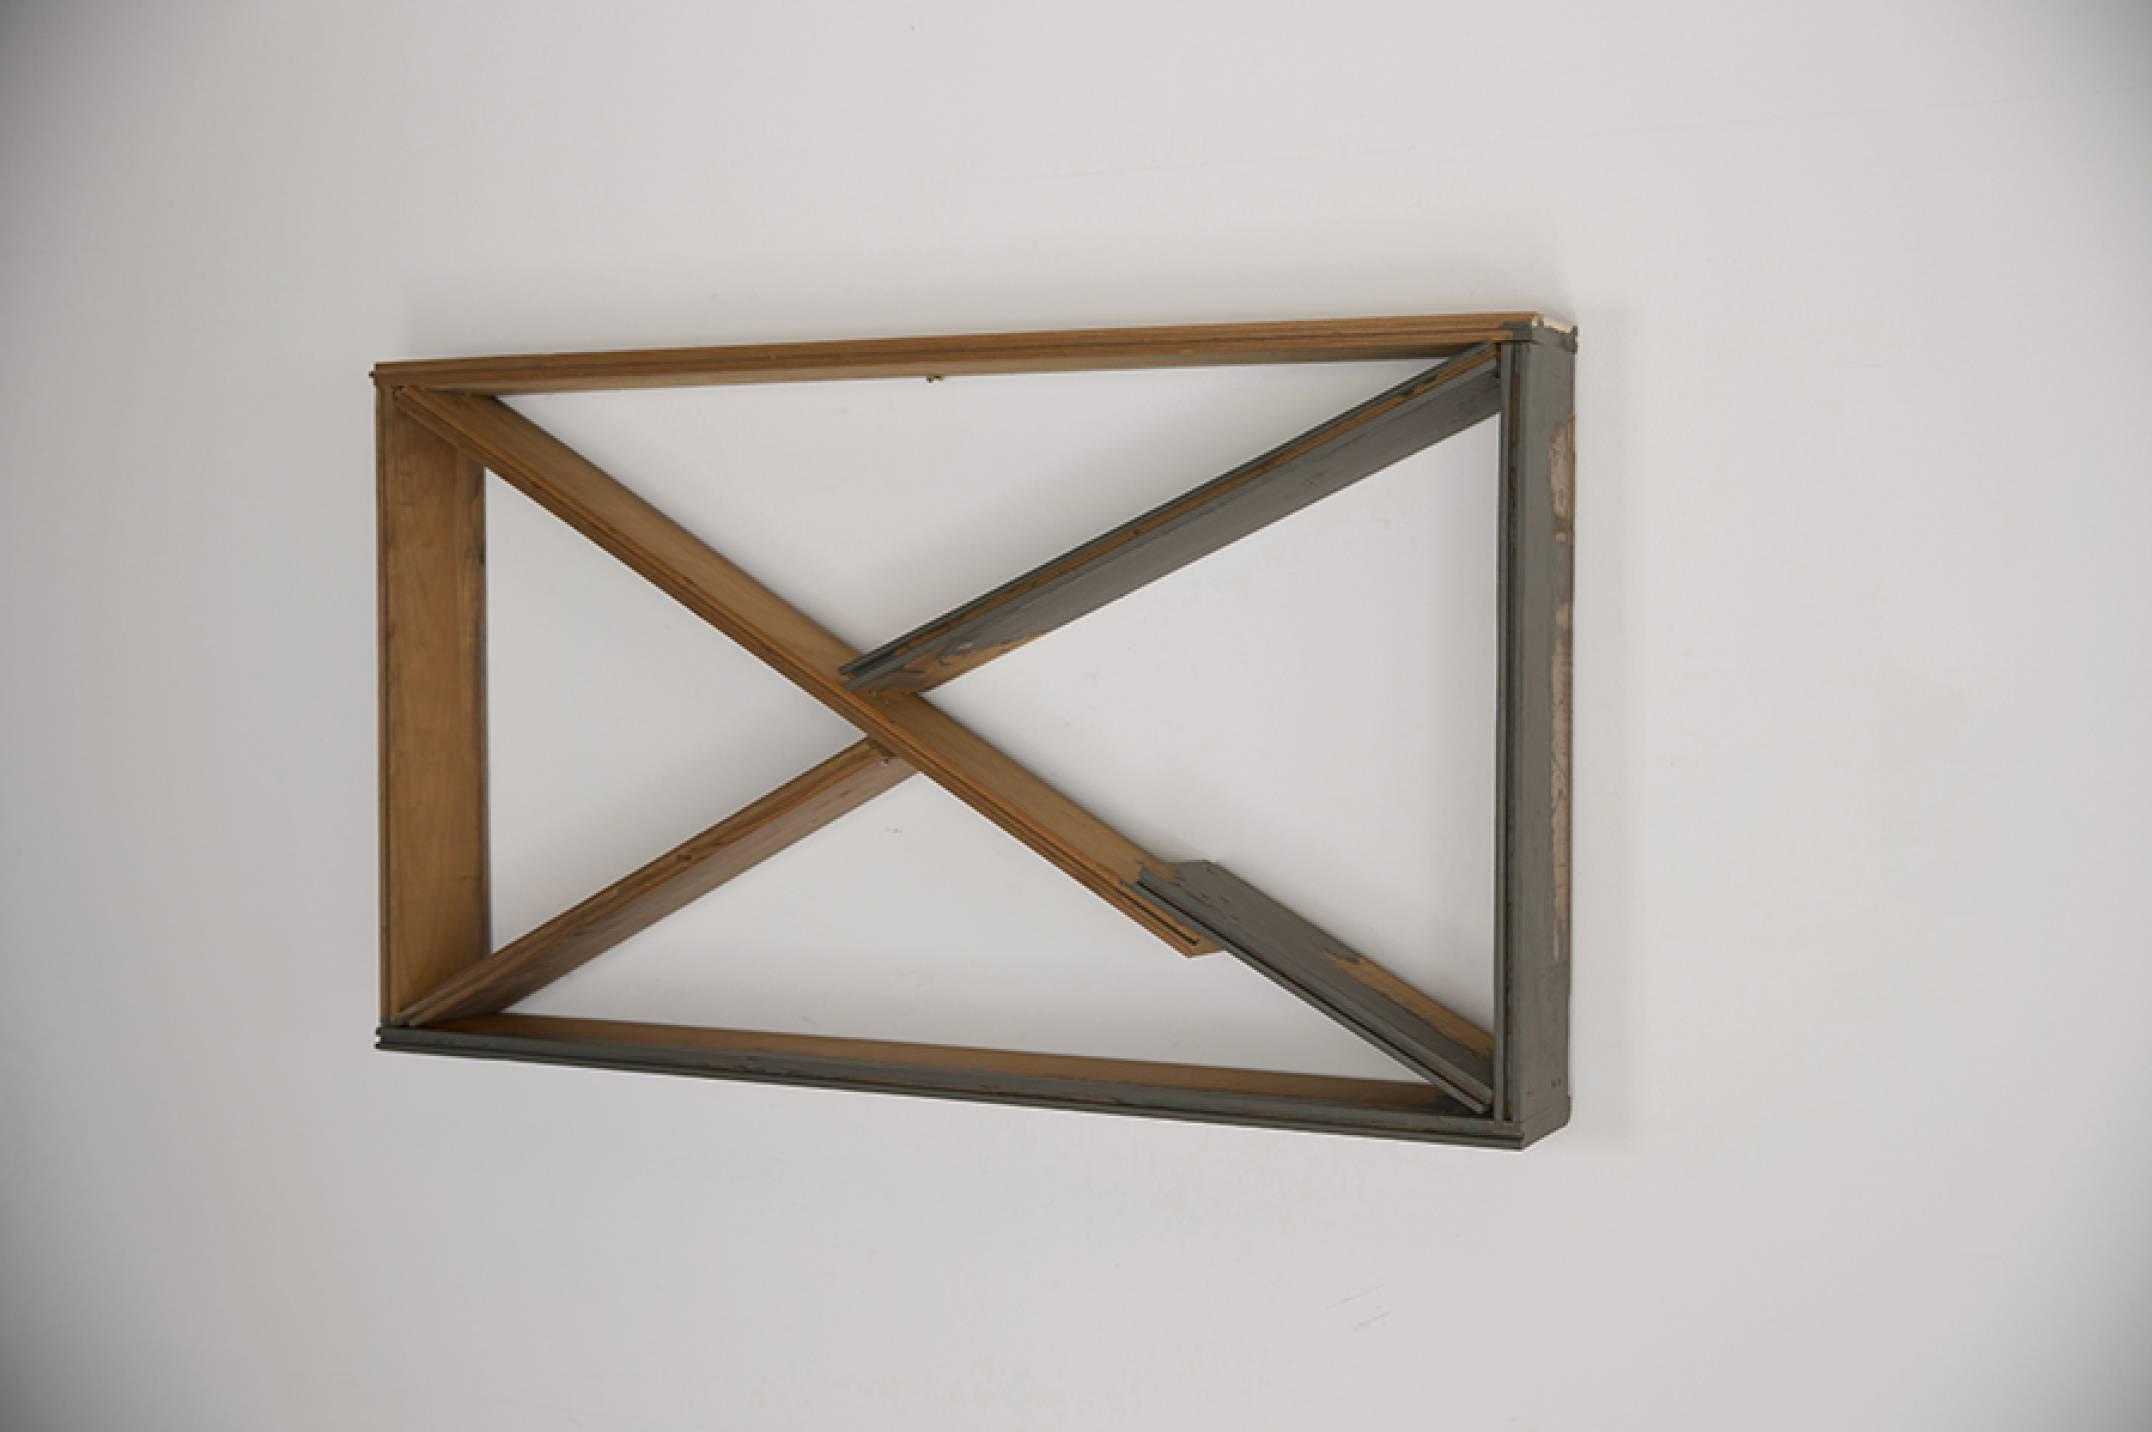 Kishio Suga,<em>Grafted Space—Z</em>, 1993, plywood, gray paint, 51,4 × 87,2 × 11,2 cm - Mendes Wood DM